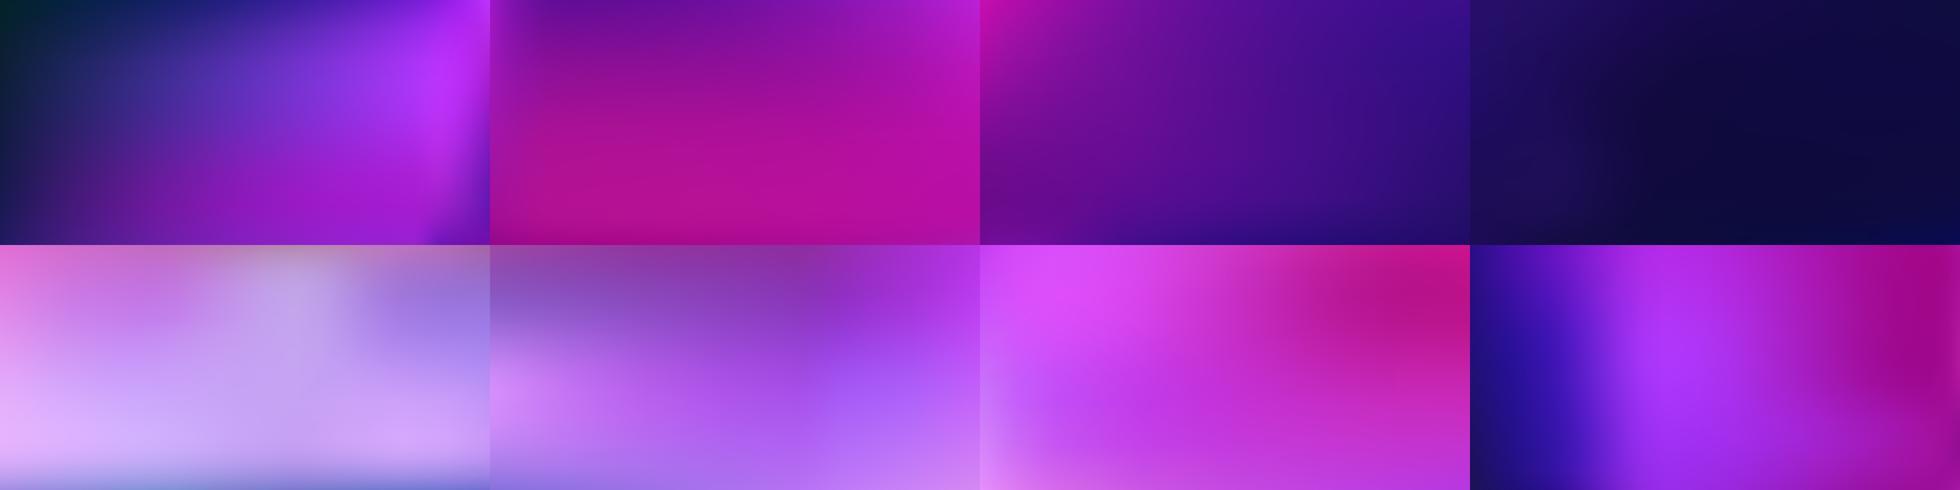 Satz glattes abstraktes buntes Maschenhintergründe Vektordesign vektor